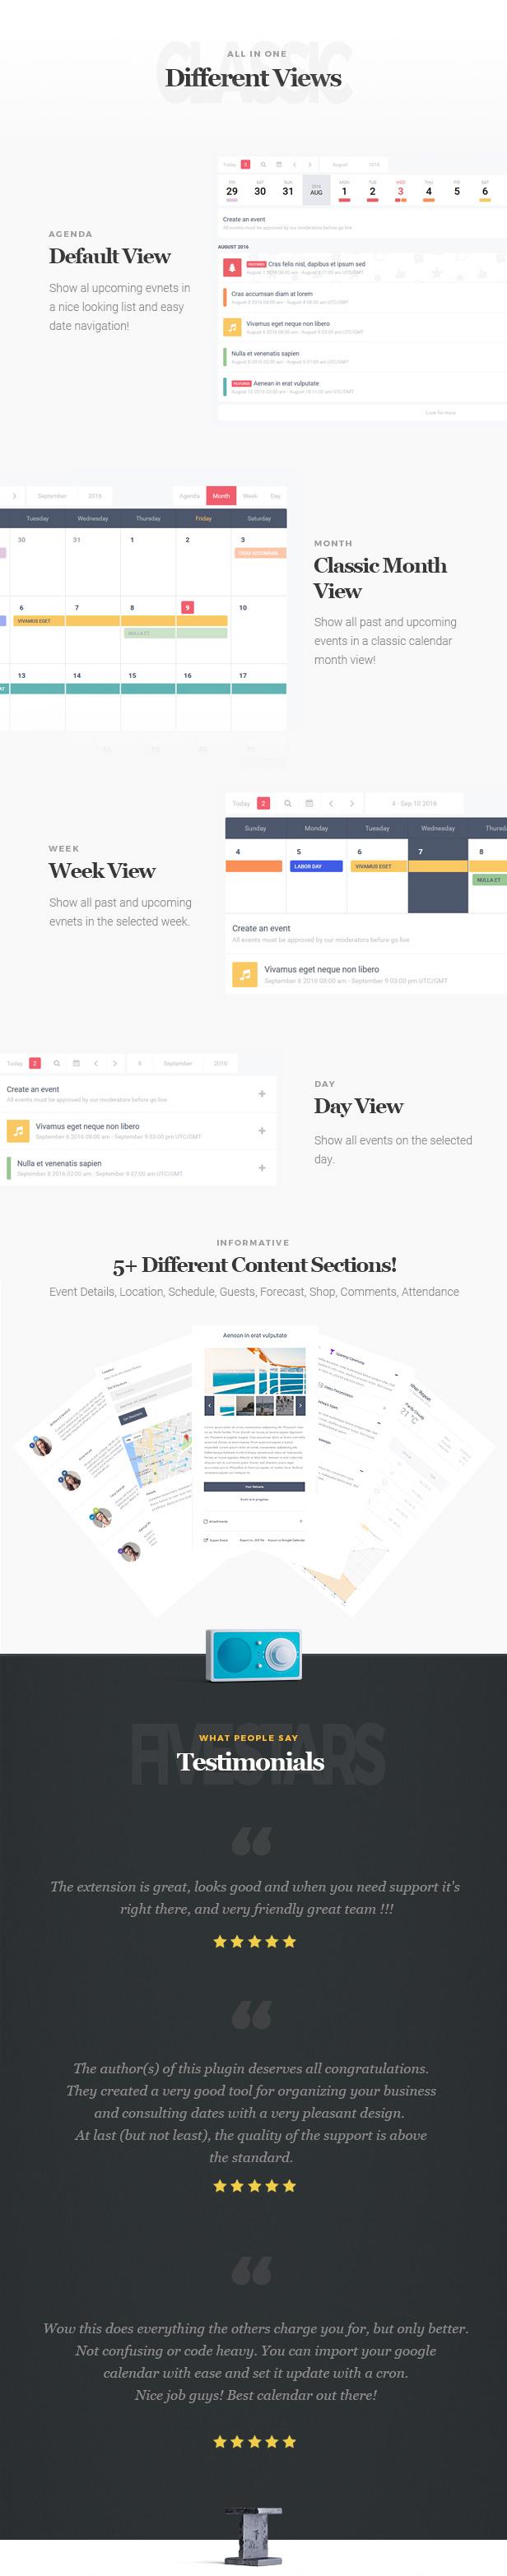 Stachethemes Event Calendar  WordPress Events Calendar inside Stachethemes Event Calendar